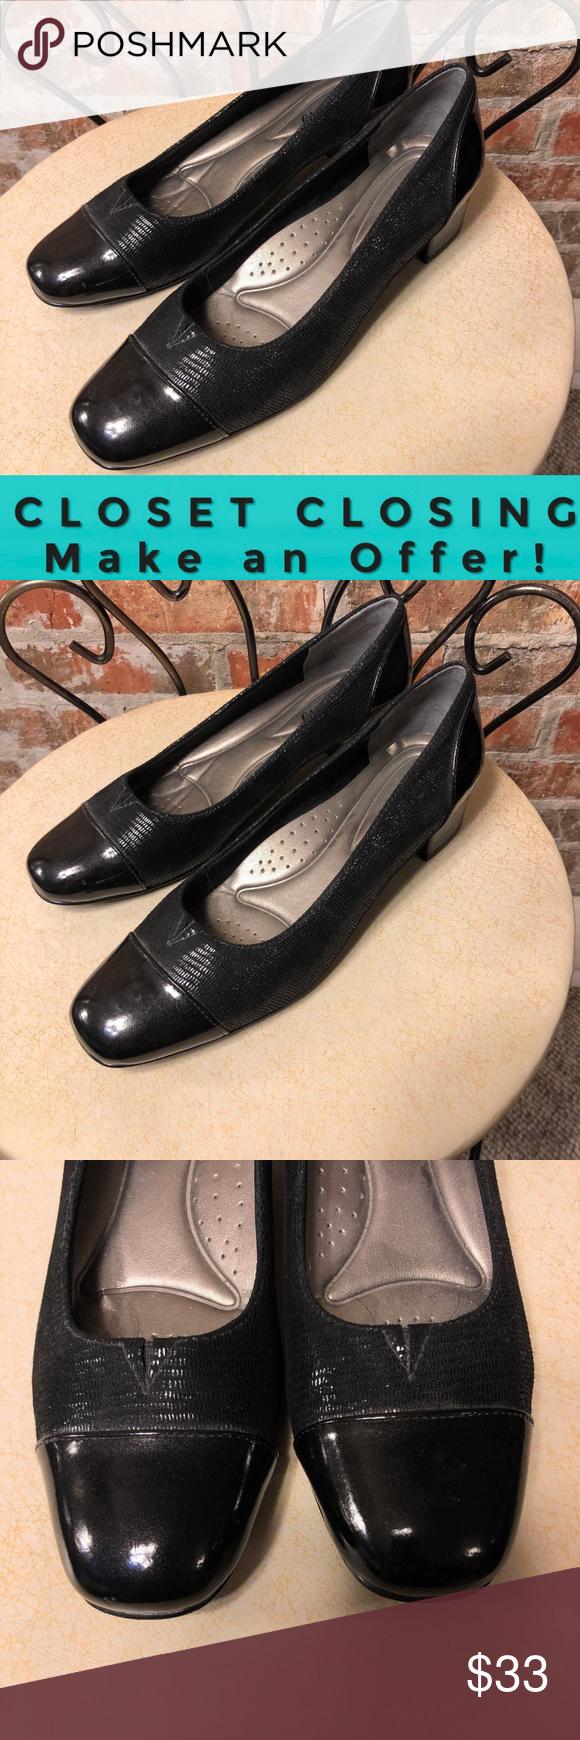 Trotters black patent kitten heels size 6.5 Black patent